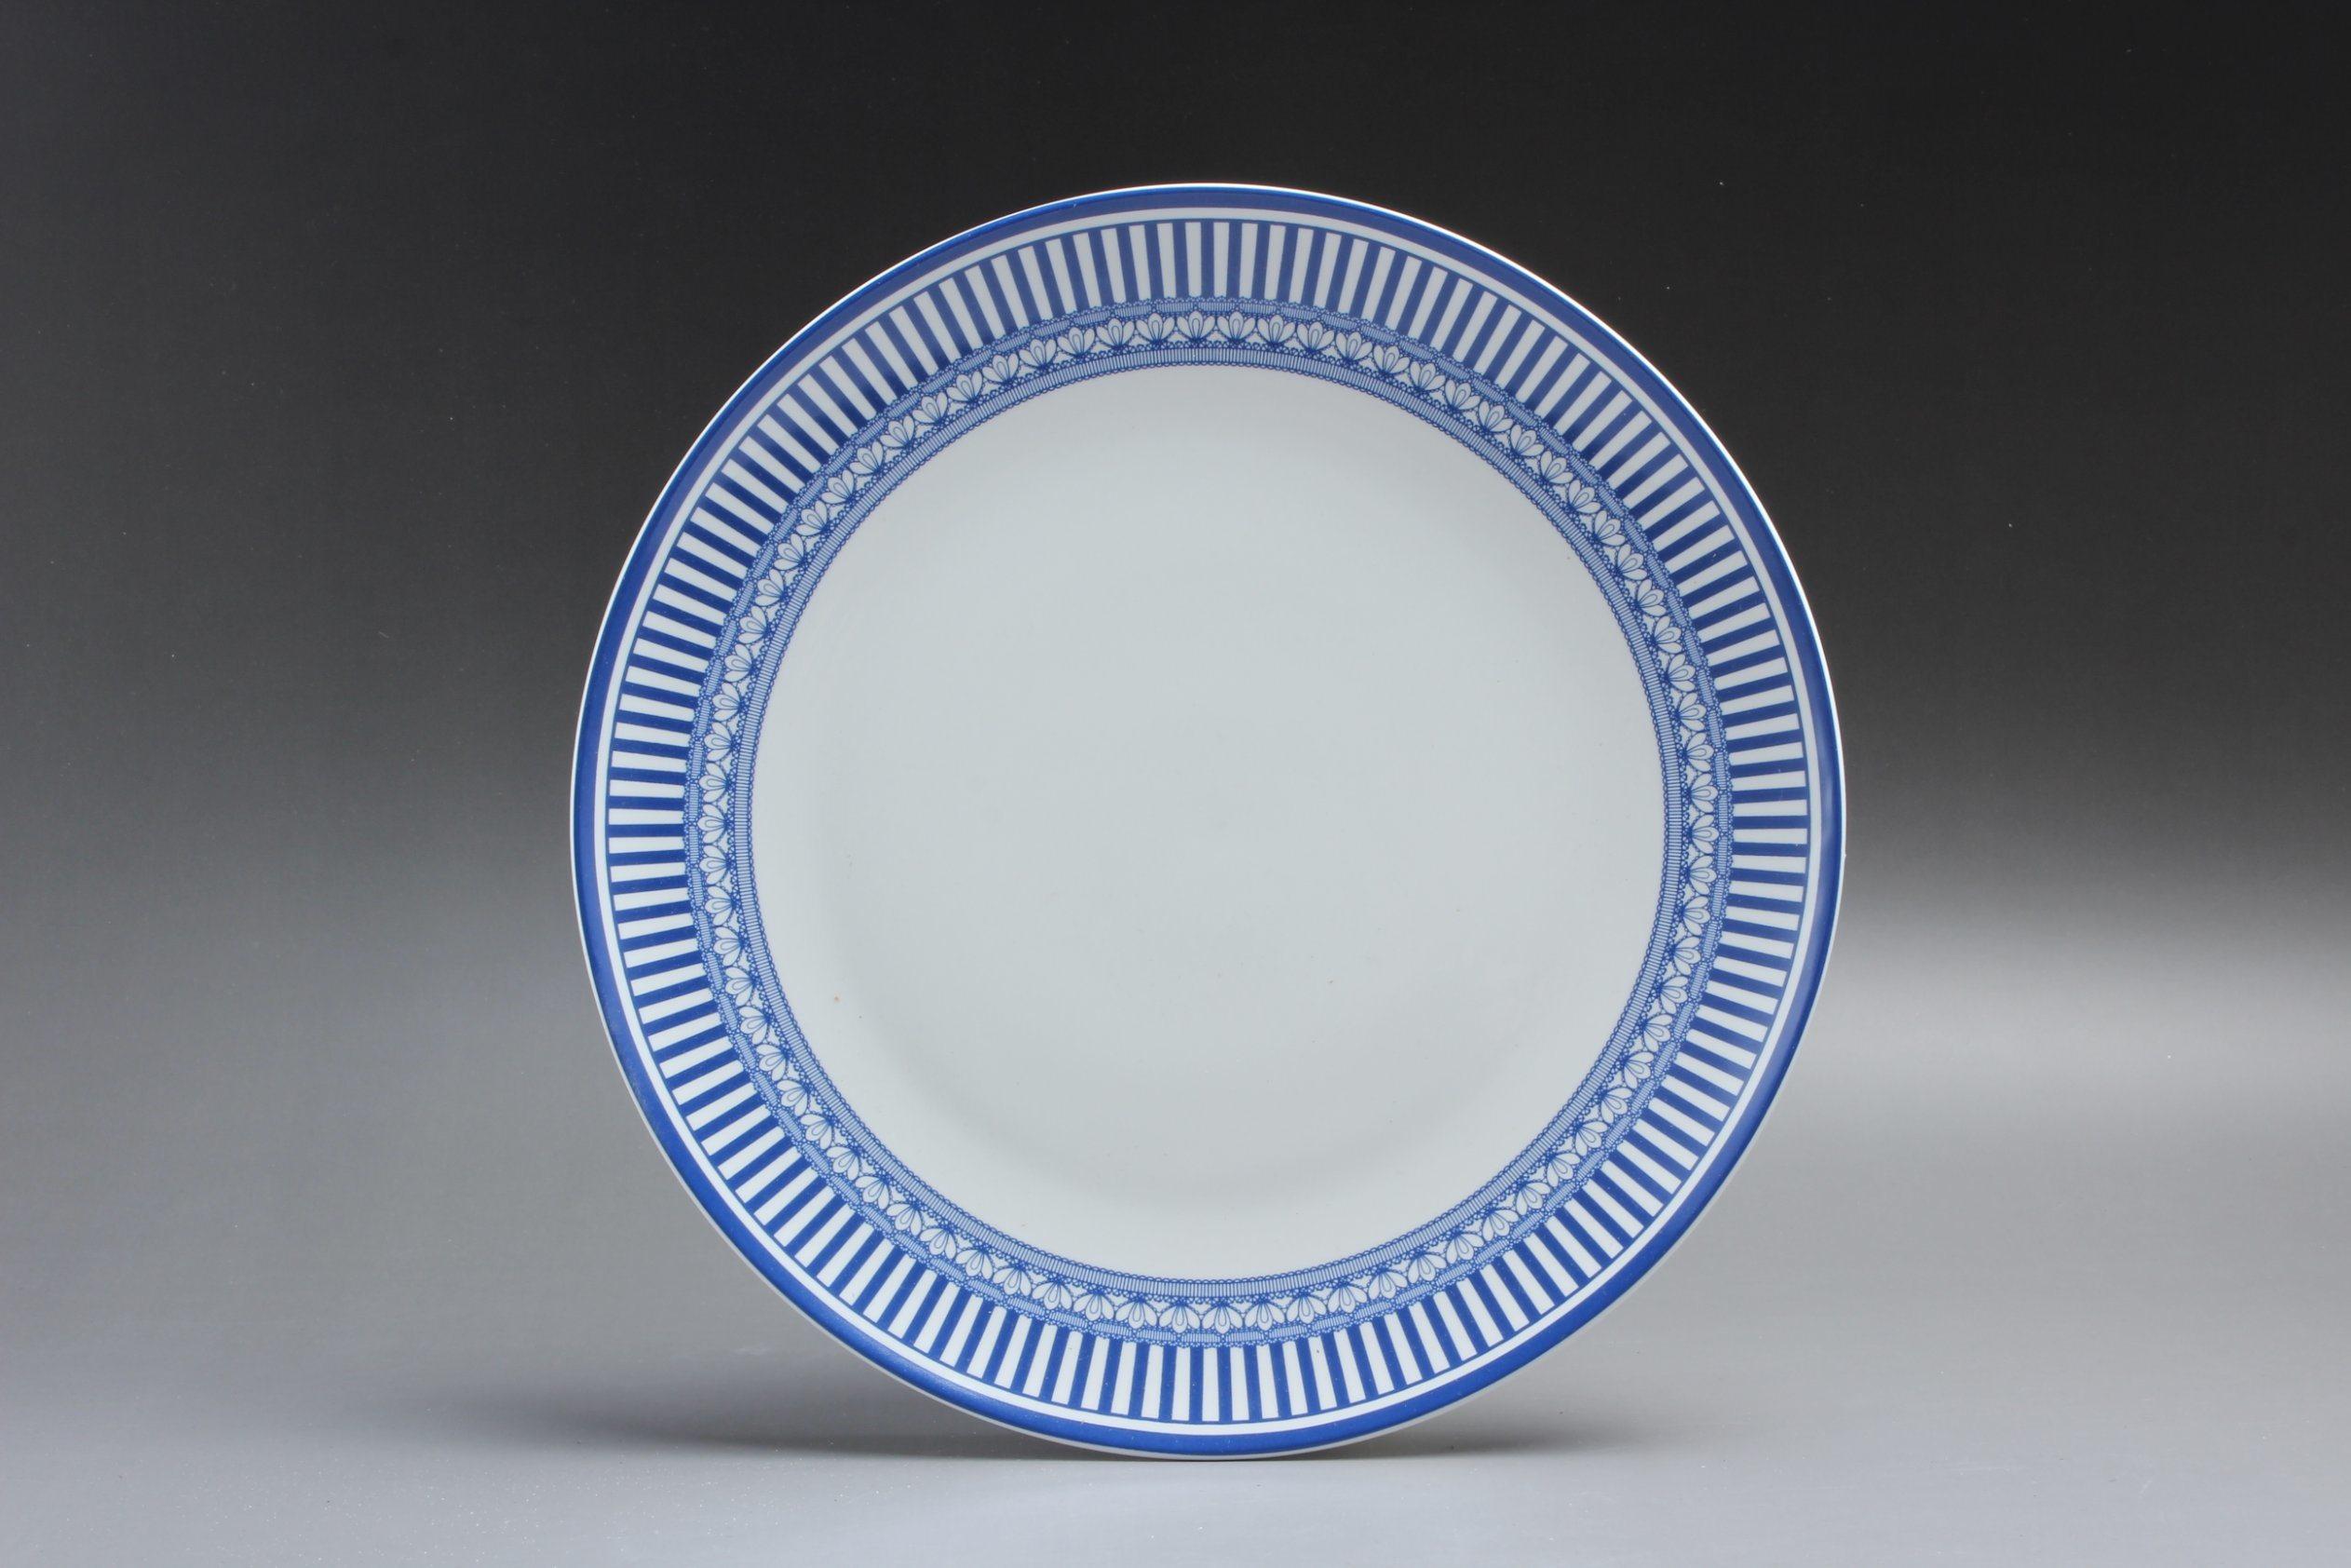 linyi jingshi ceramics co ltd